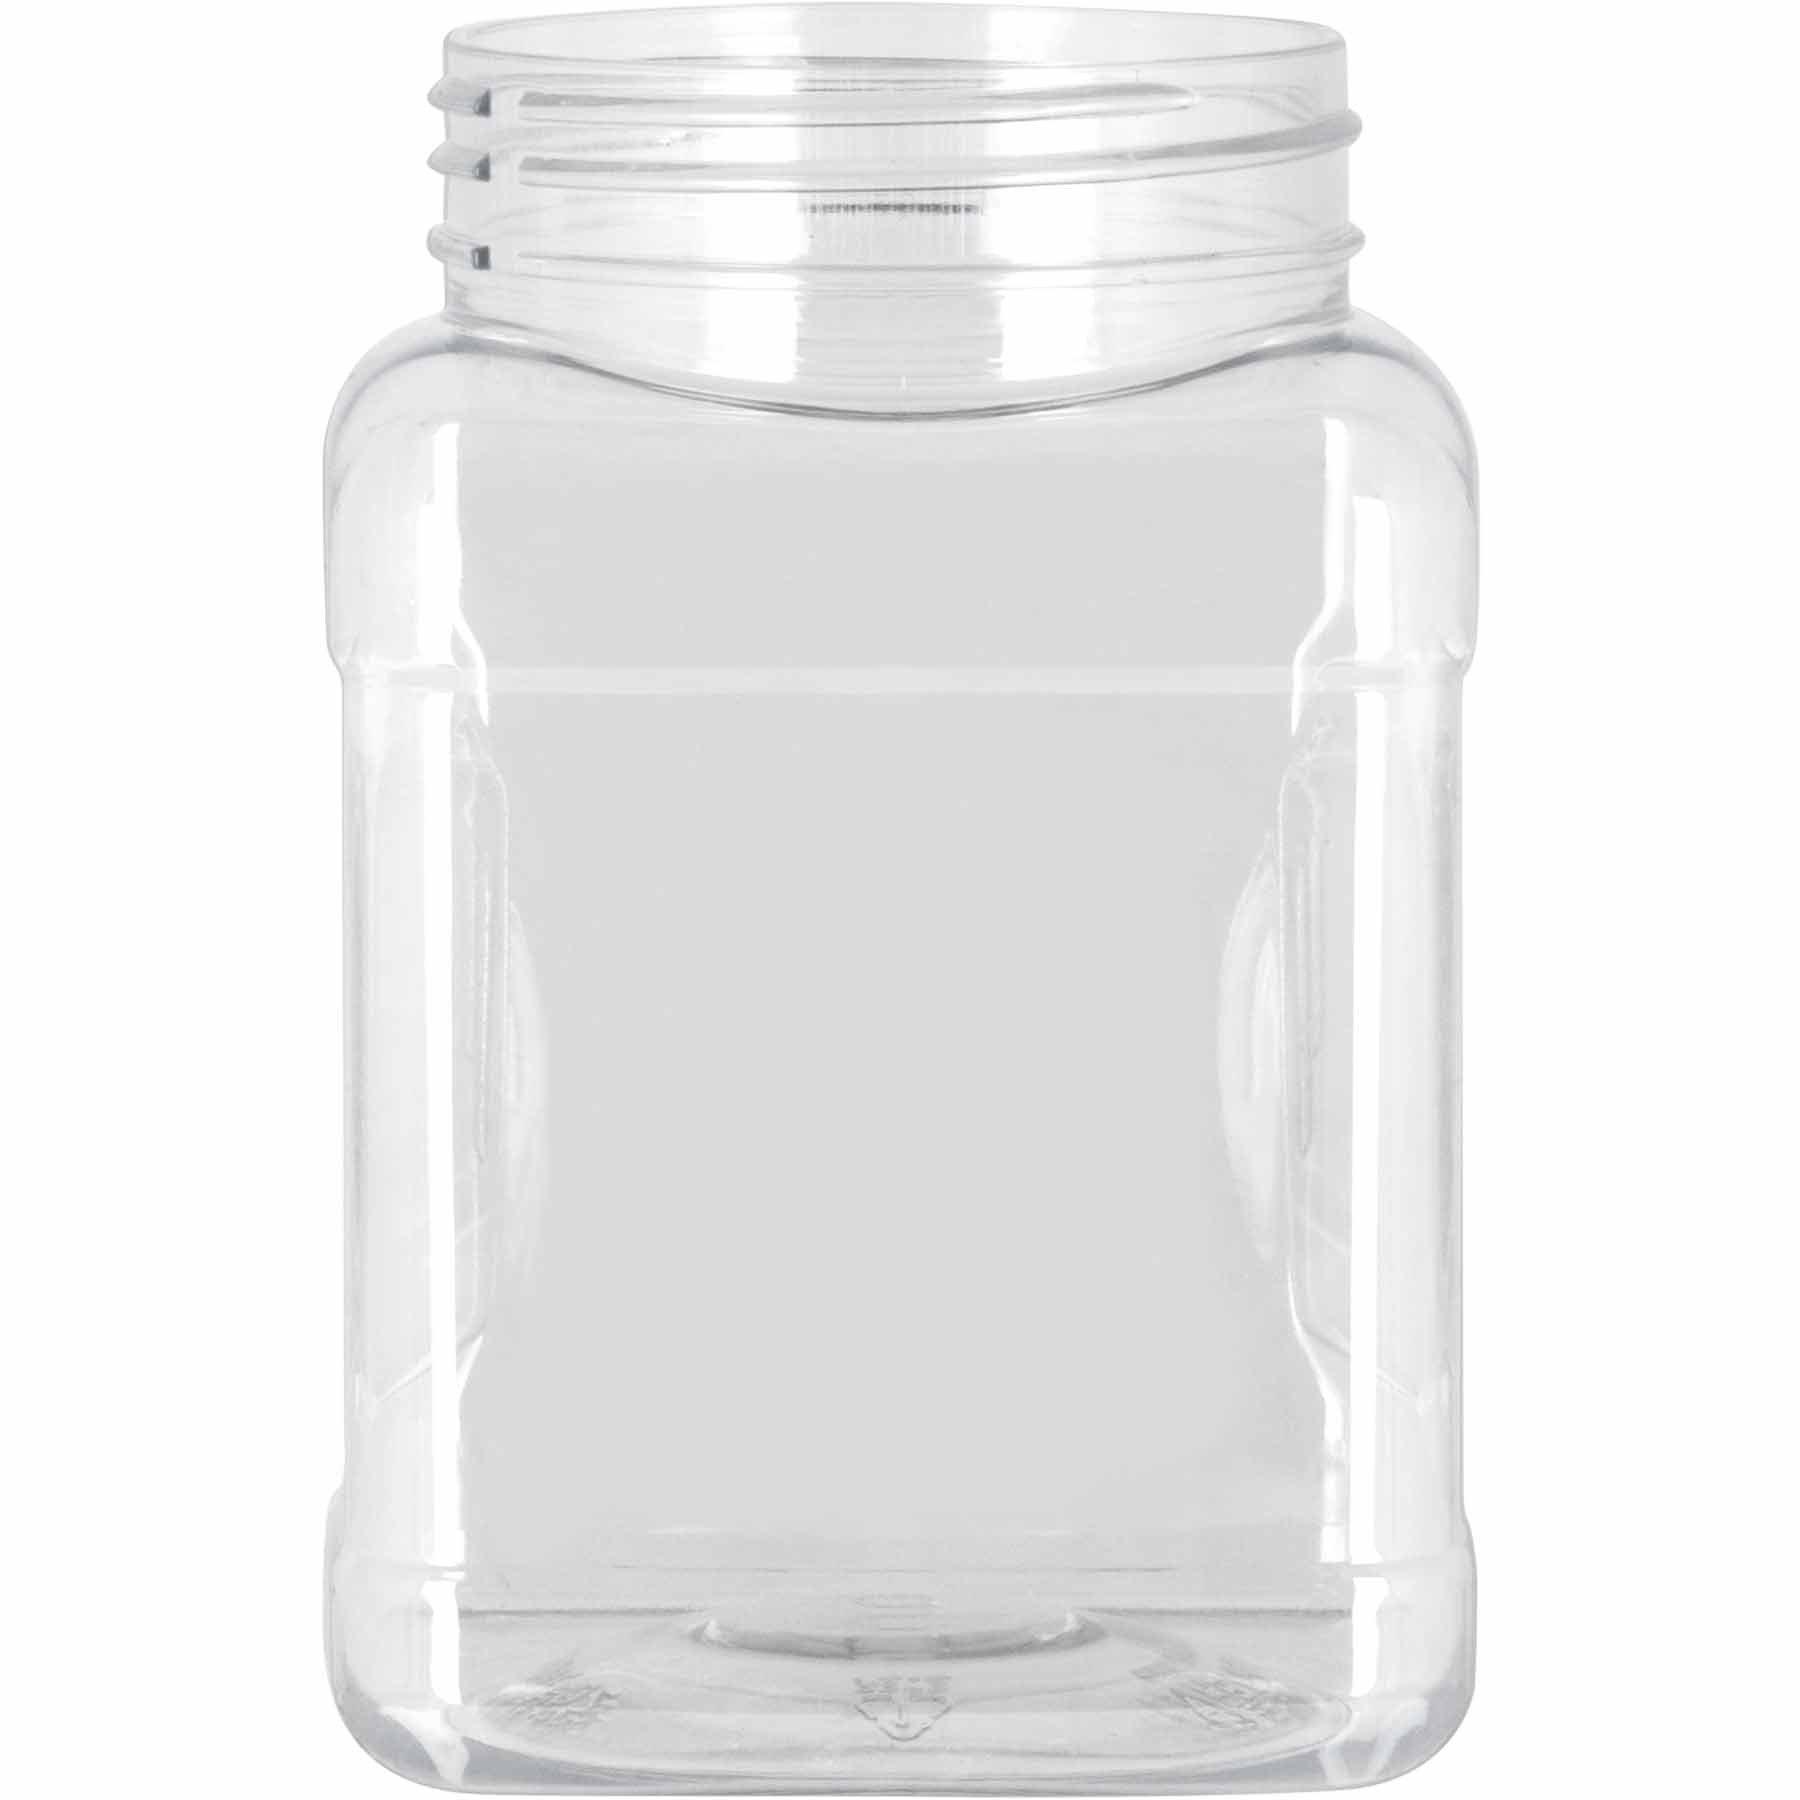 Pride Of India Clear Food Grade PET Plastic Square Grip Storage Jar w/Cap - 16 Fluid Ounces - 12-Jar Pack (1-2 Cup Storage Capacity) by